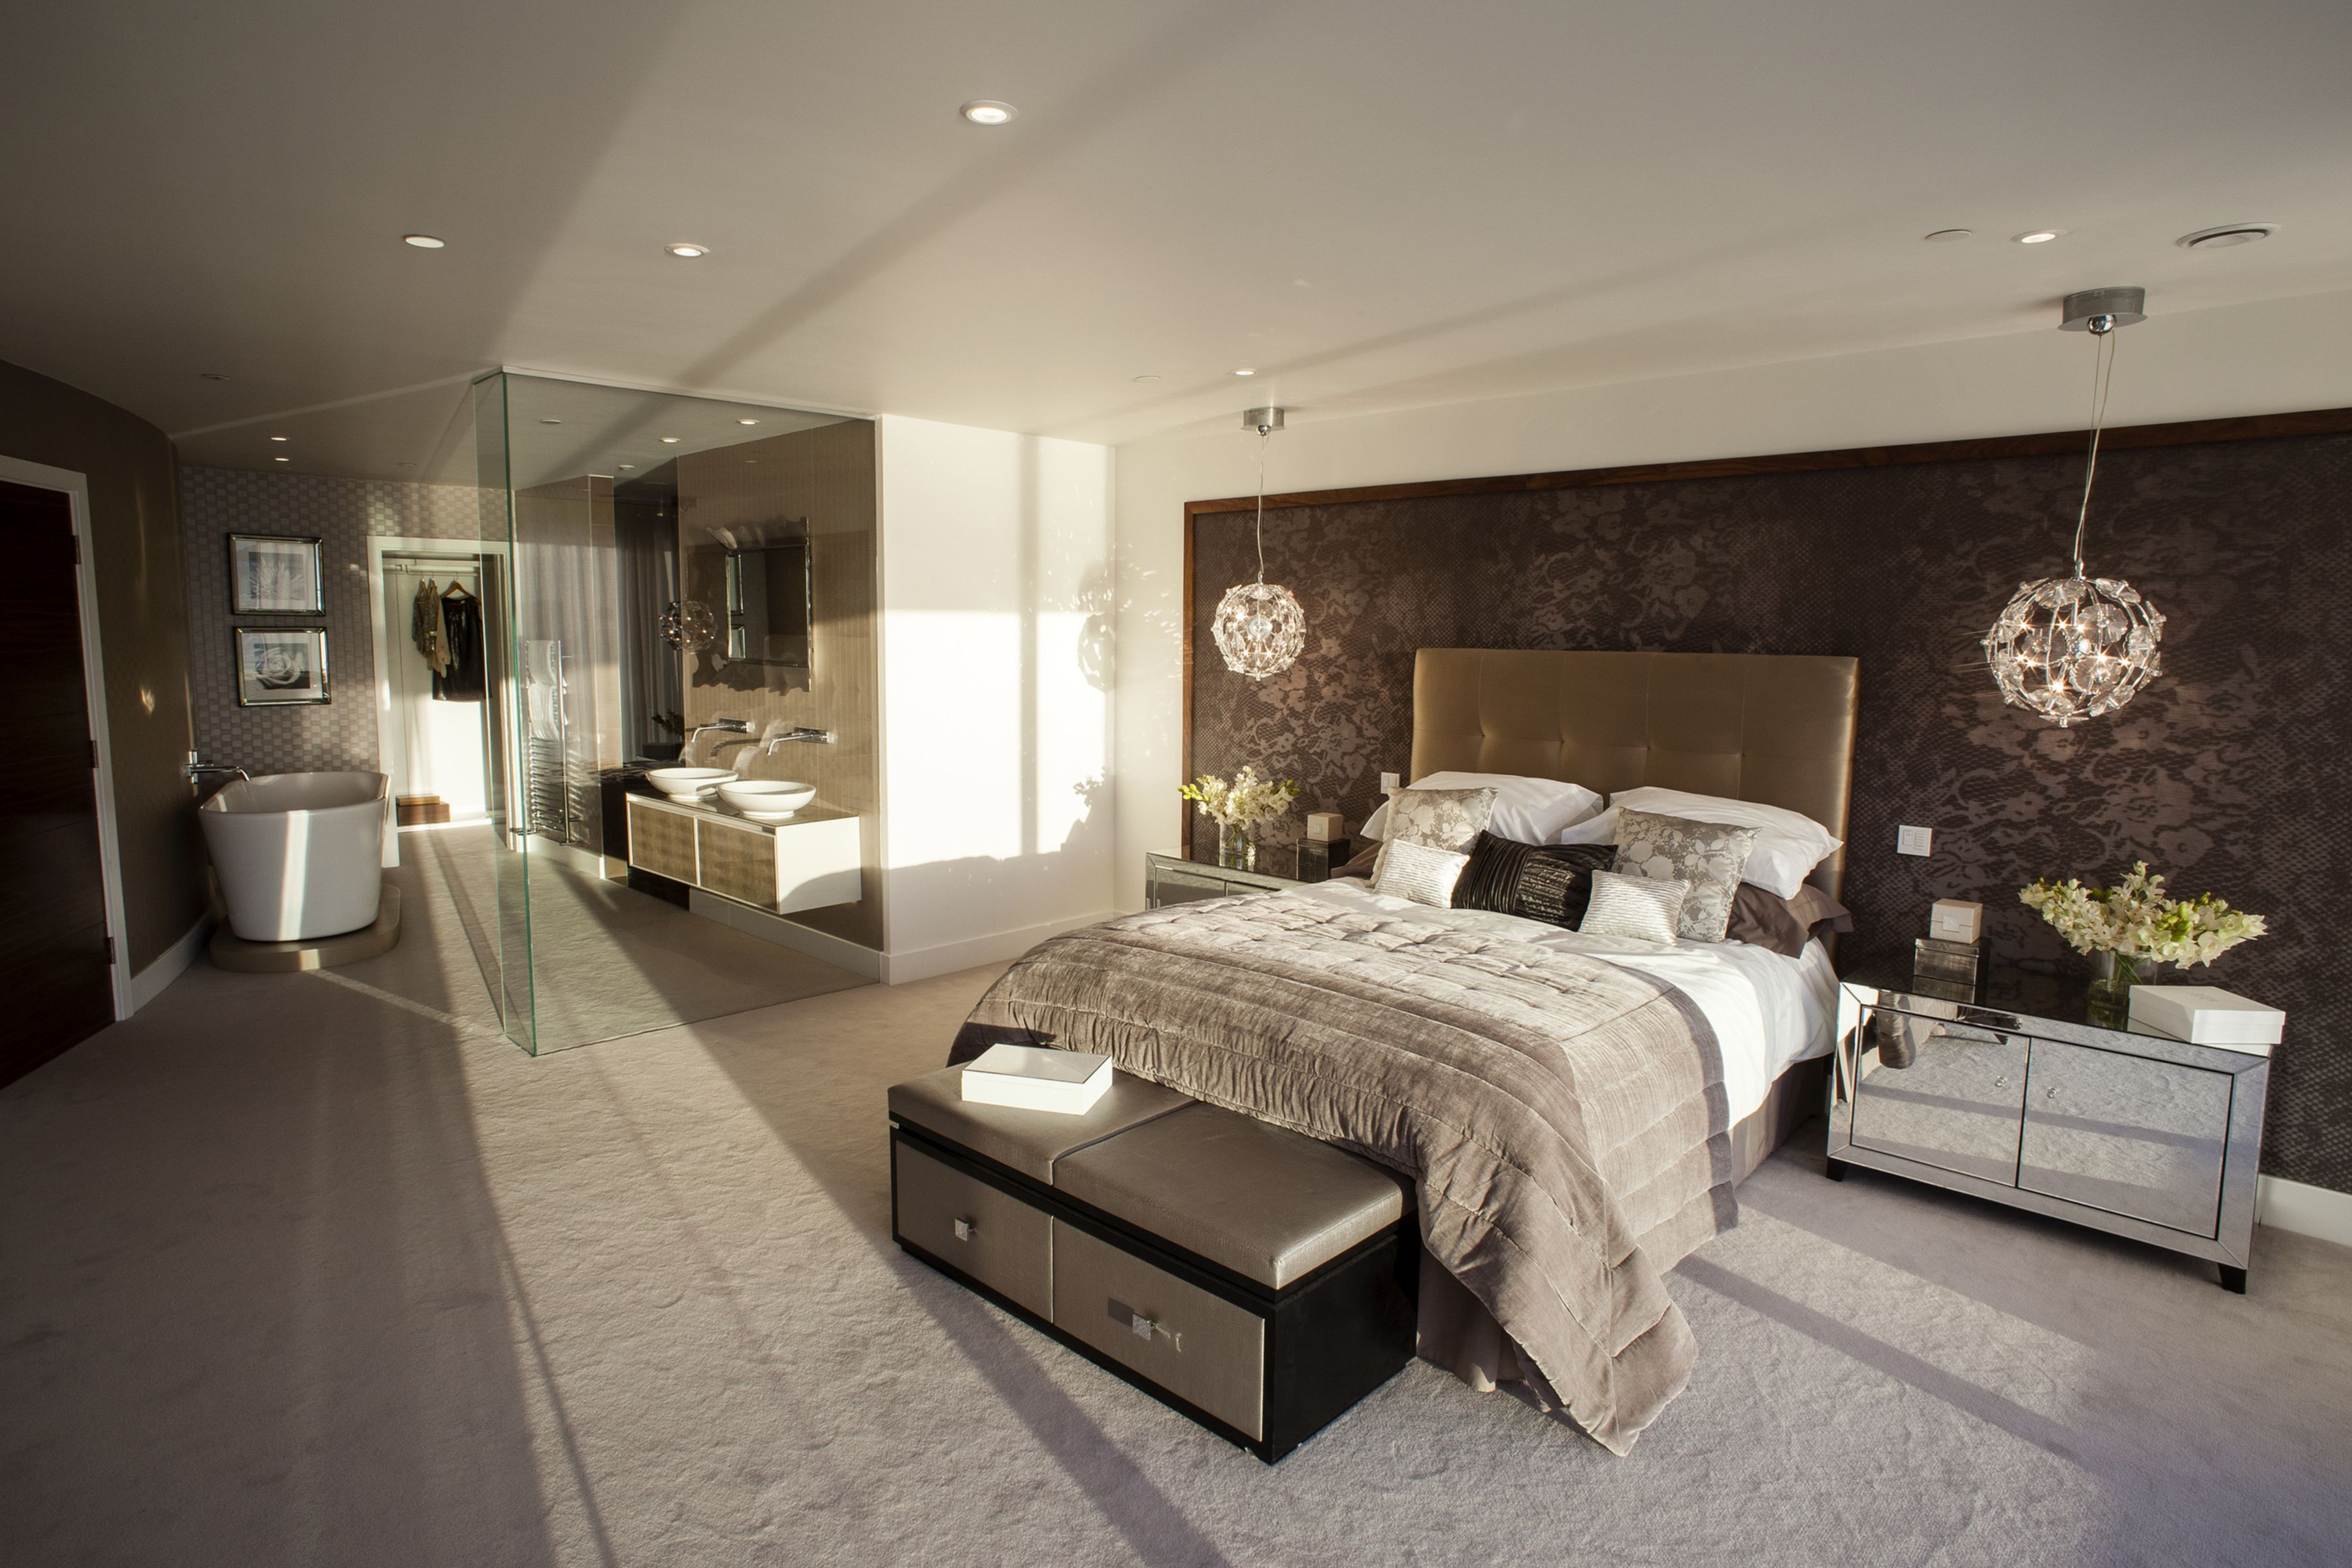 45 Gorgeous Modern Master Bedroom Design Ideas For Comfortable Sleep Modern Luxury Bedroom Luxury Bedroom Design Modern Master Bedroom Design